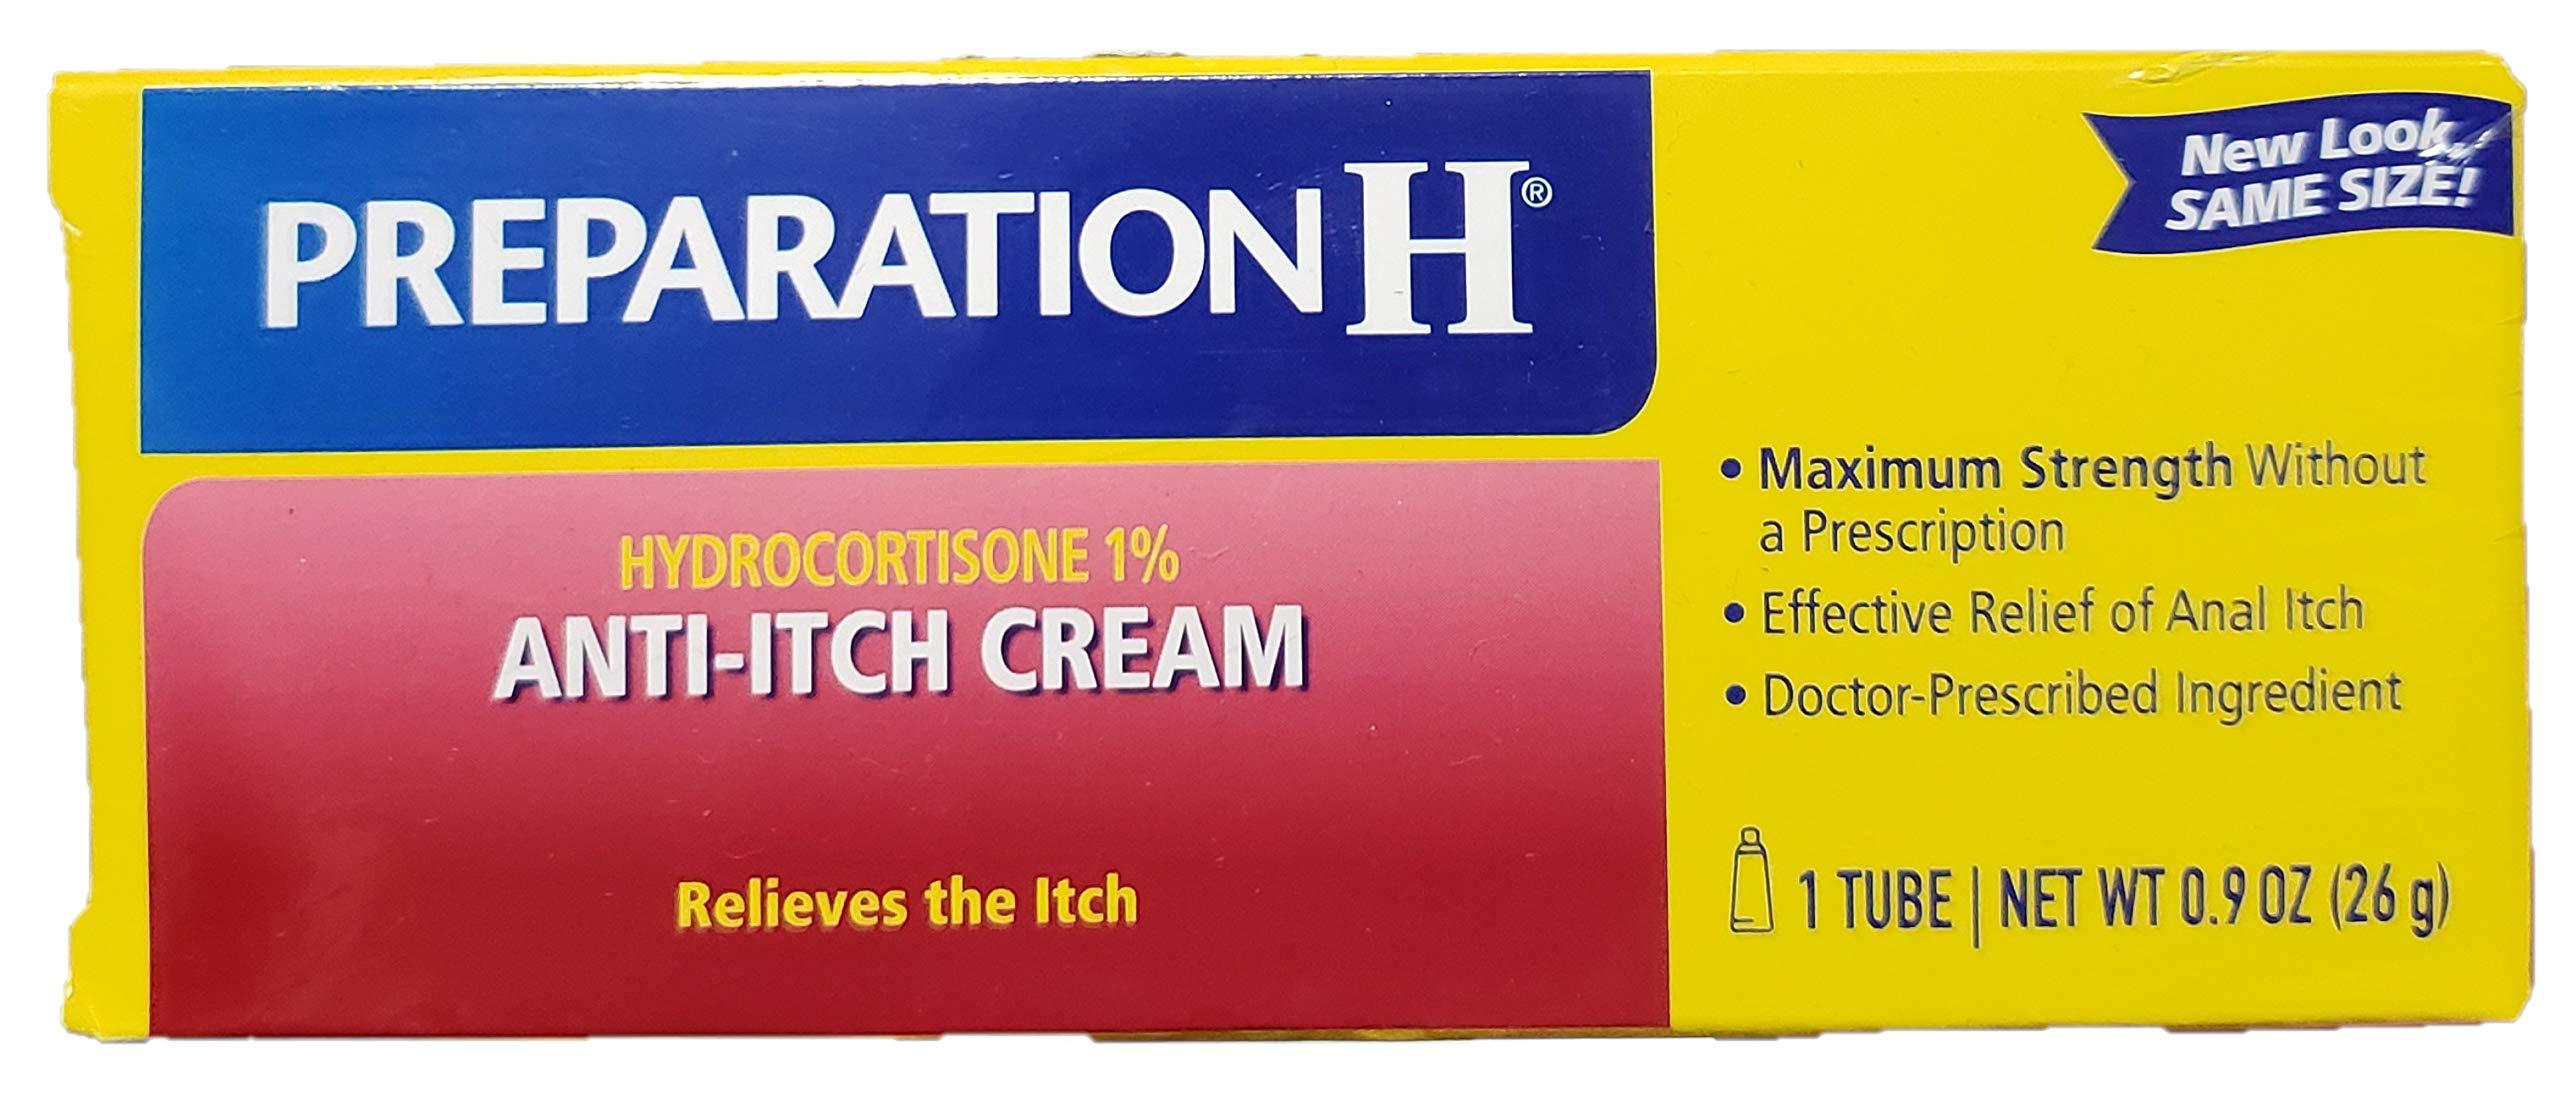 Preparation H Anti-Itch Cream Hydrocortisone 1% 0.90 oz (Pack of 4)